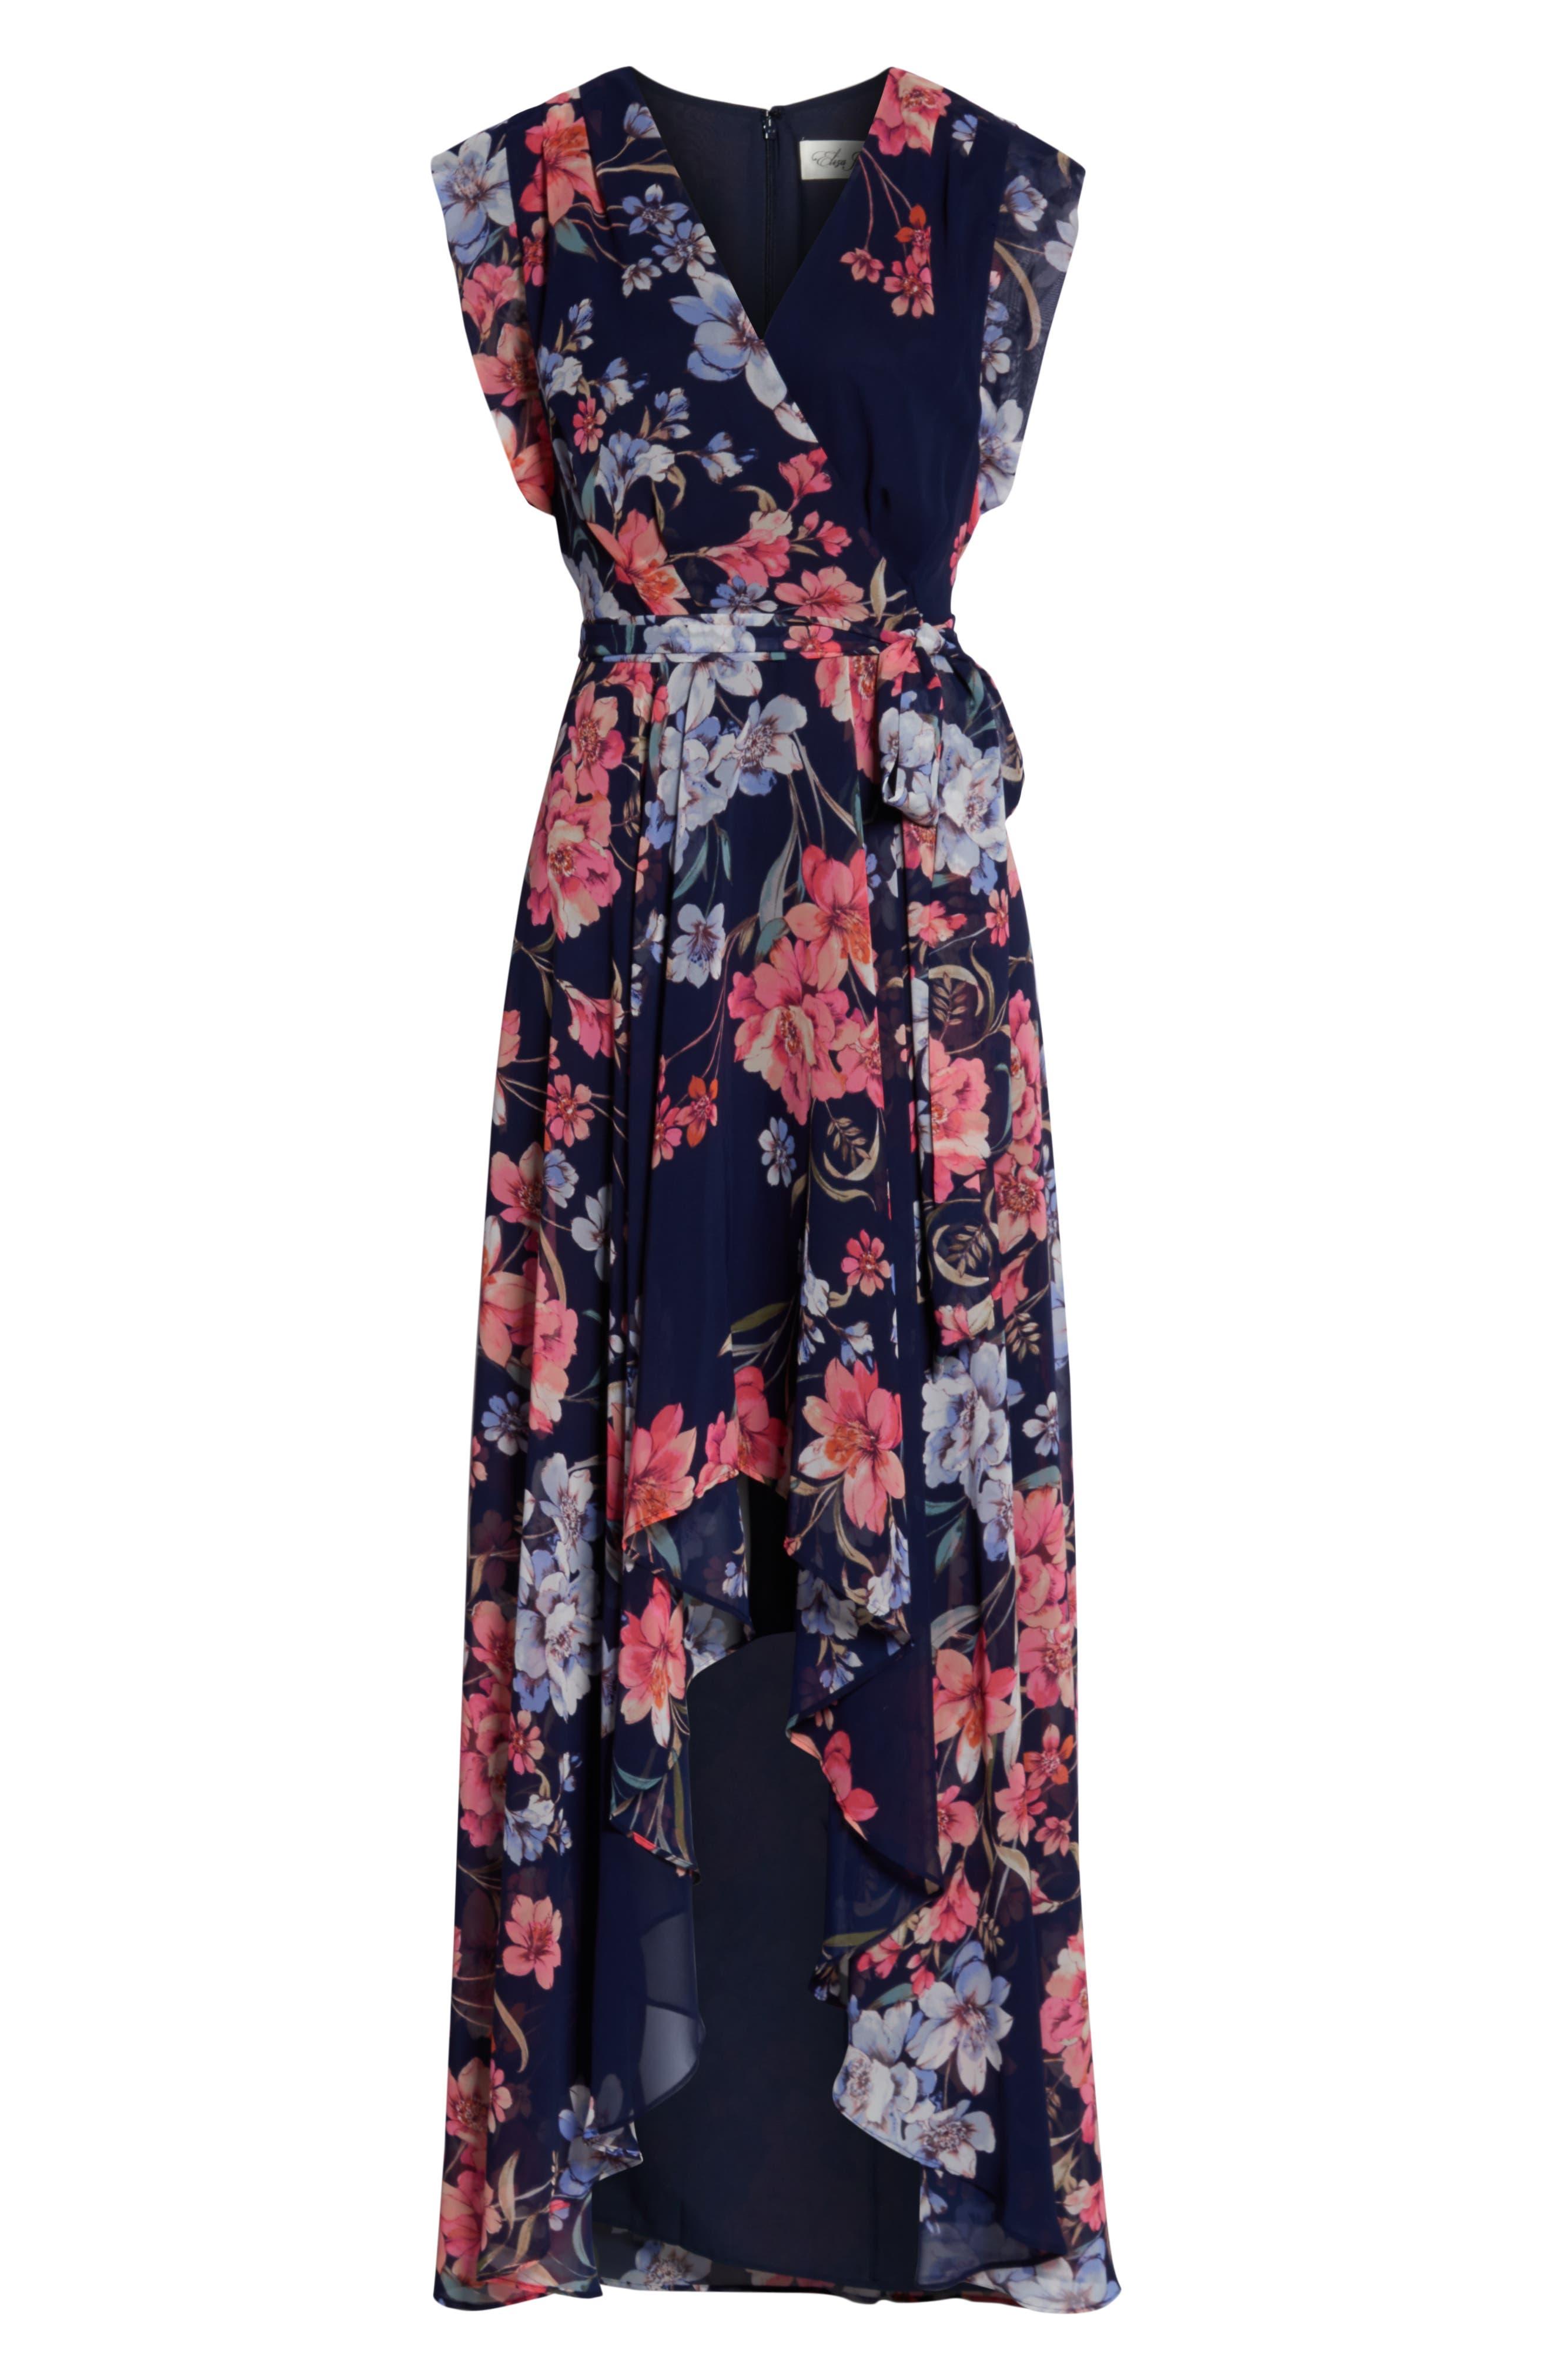 ELIZA J, Floral High/Low Faux Wrap Chiffon Dress, Alternate thumbnail 7, color, NAVY